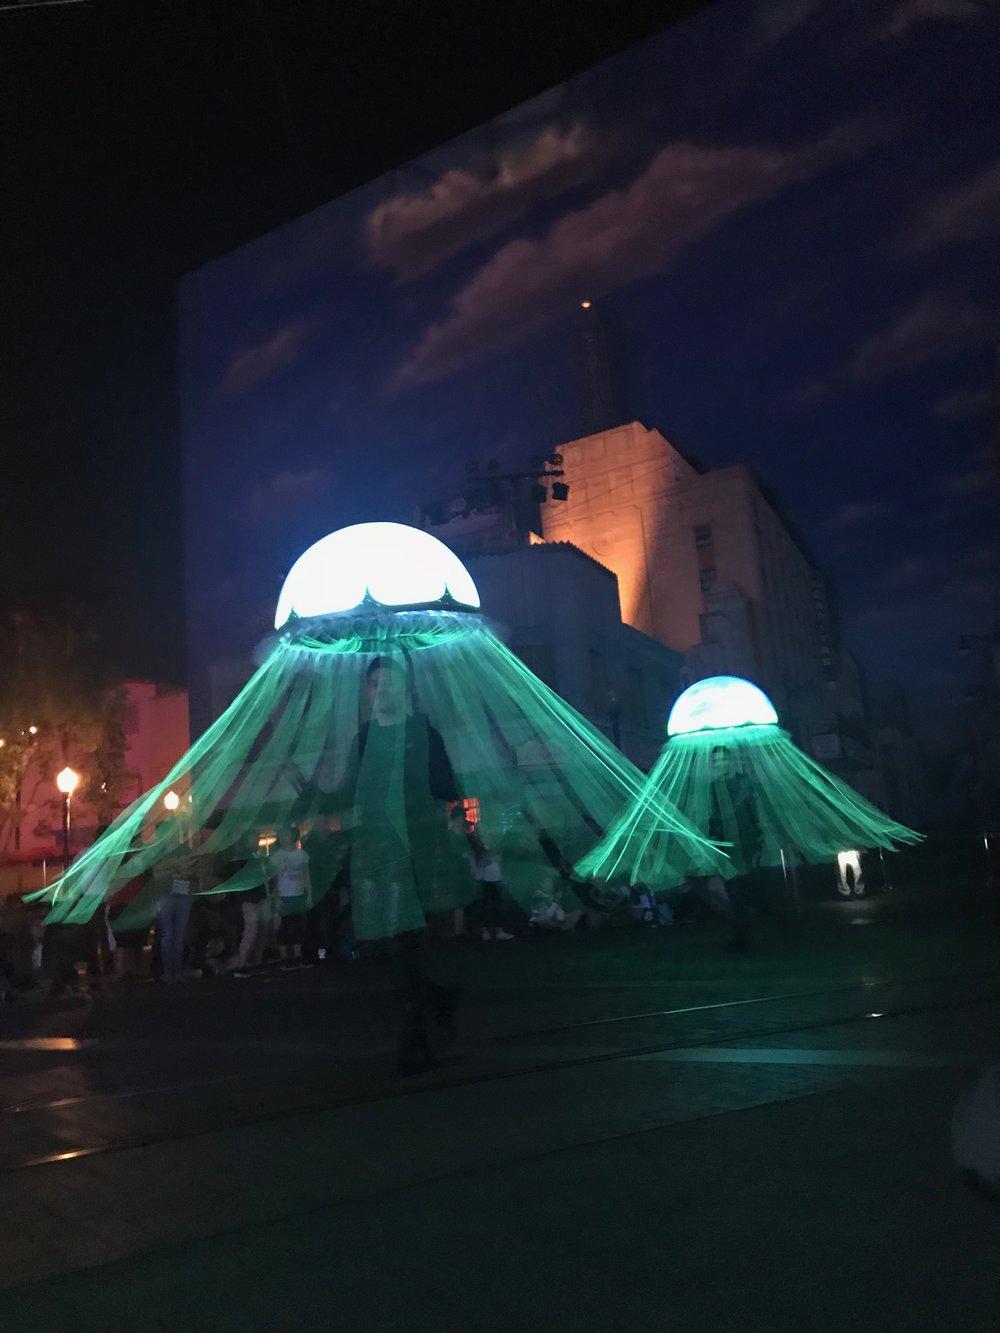 The spinning jellyfish umbrellas!